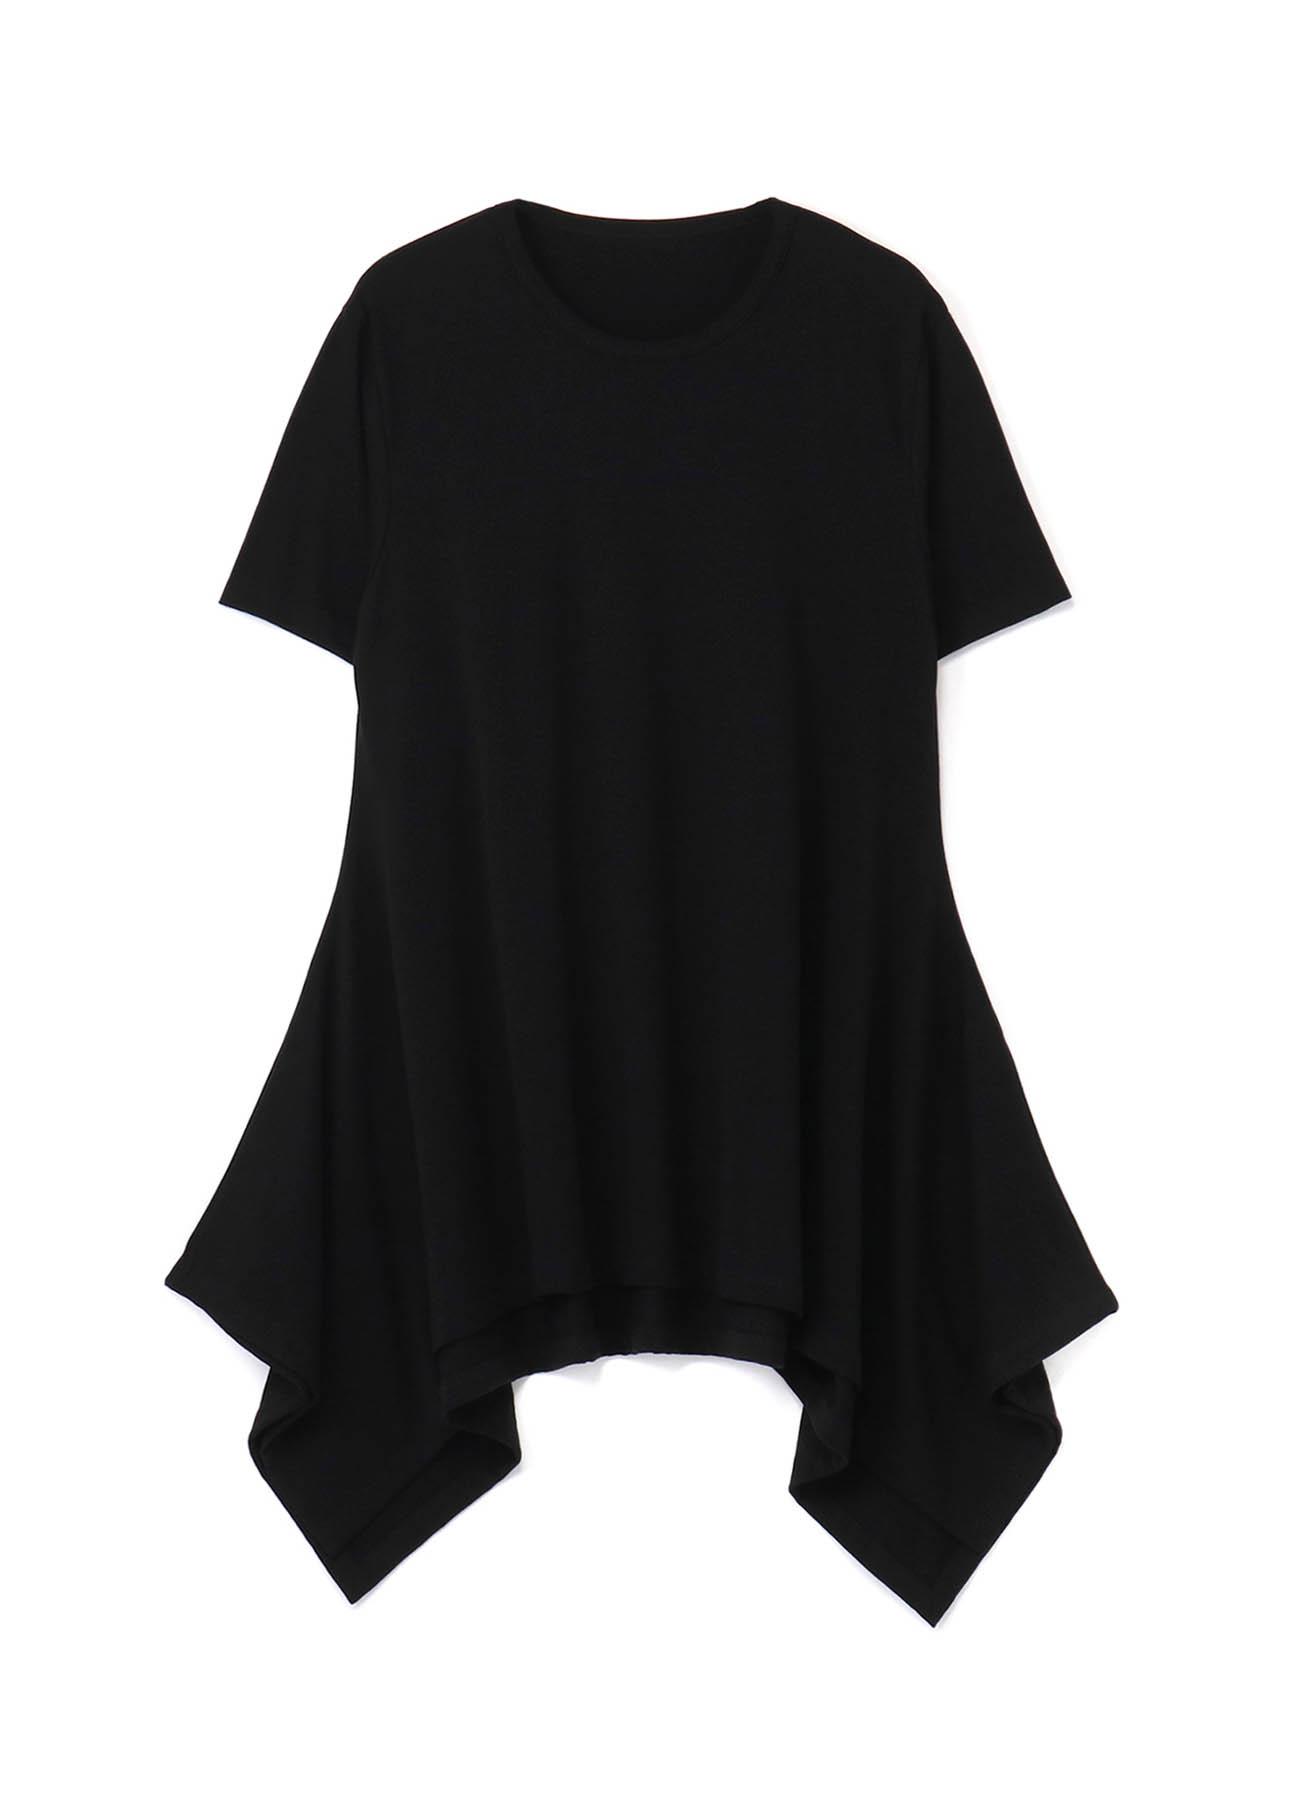 30/Cotton Jersey U-neck Drape Short Sleeves Cut Sew